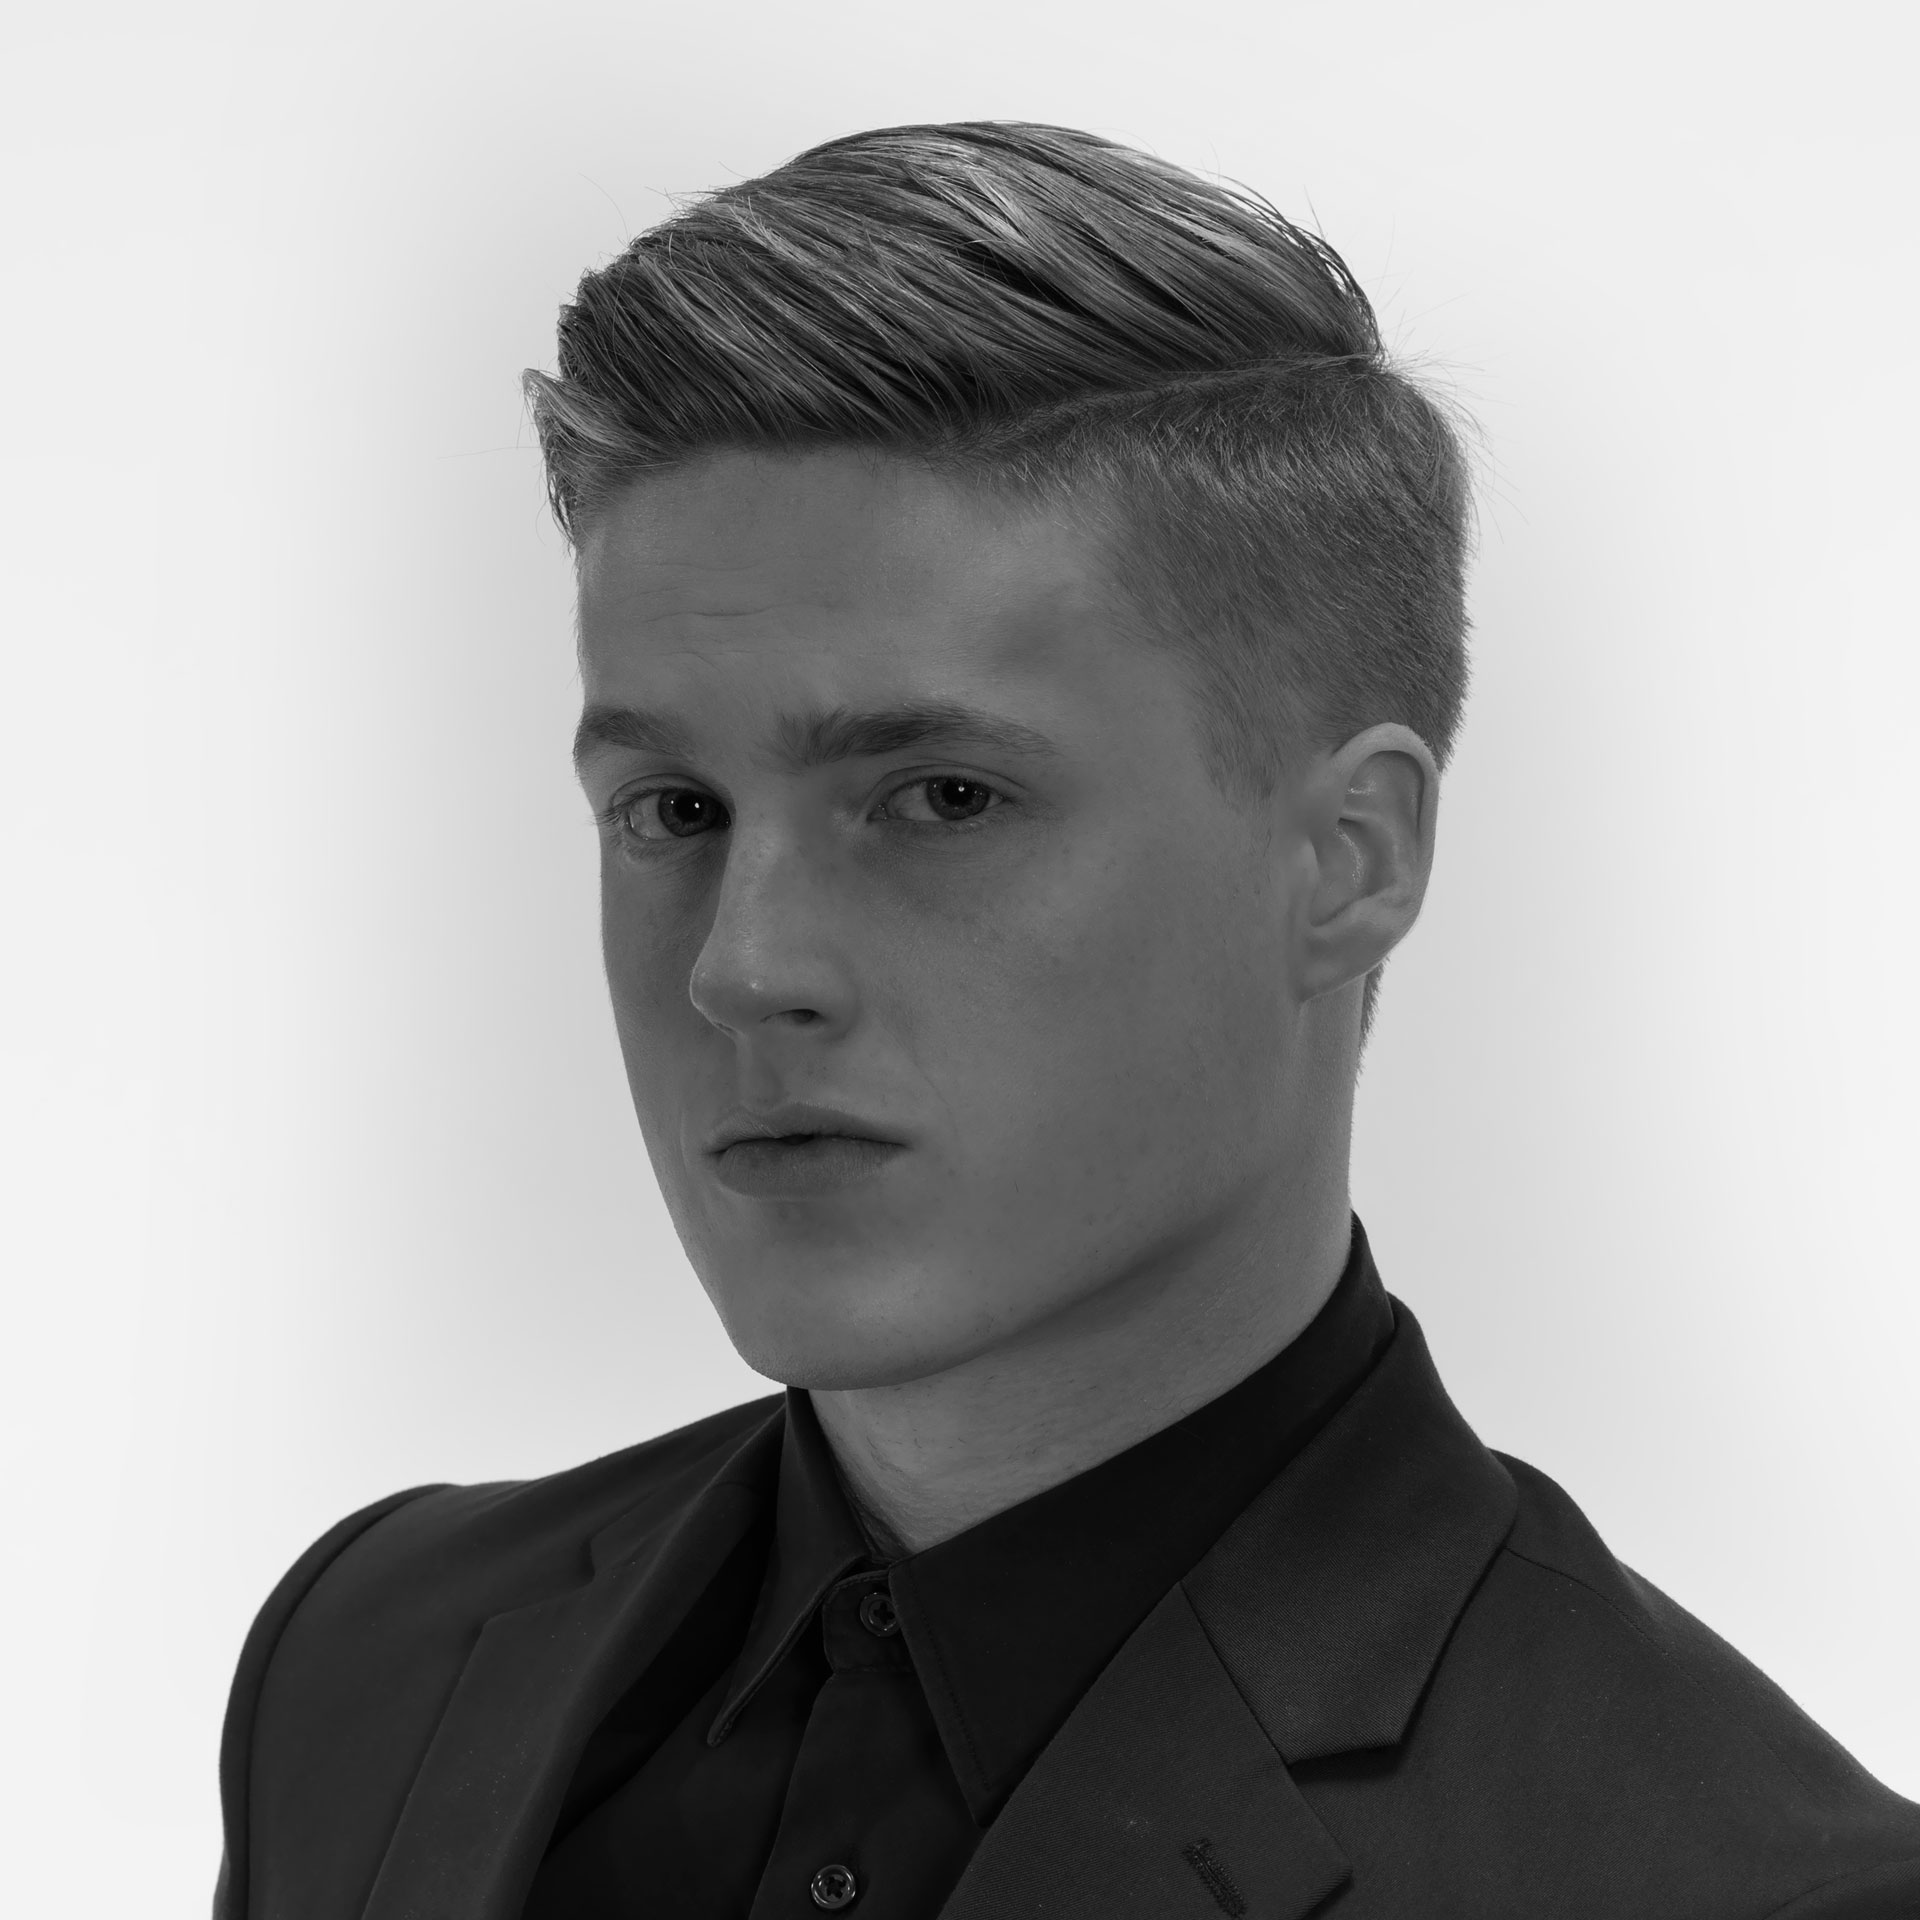 Men Hair Salon Plano Frisco Dallas Best Mens Haircut Allen Mckinley Addison Tx Dfw Color Modern